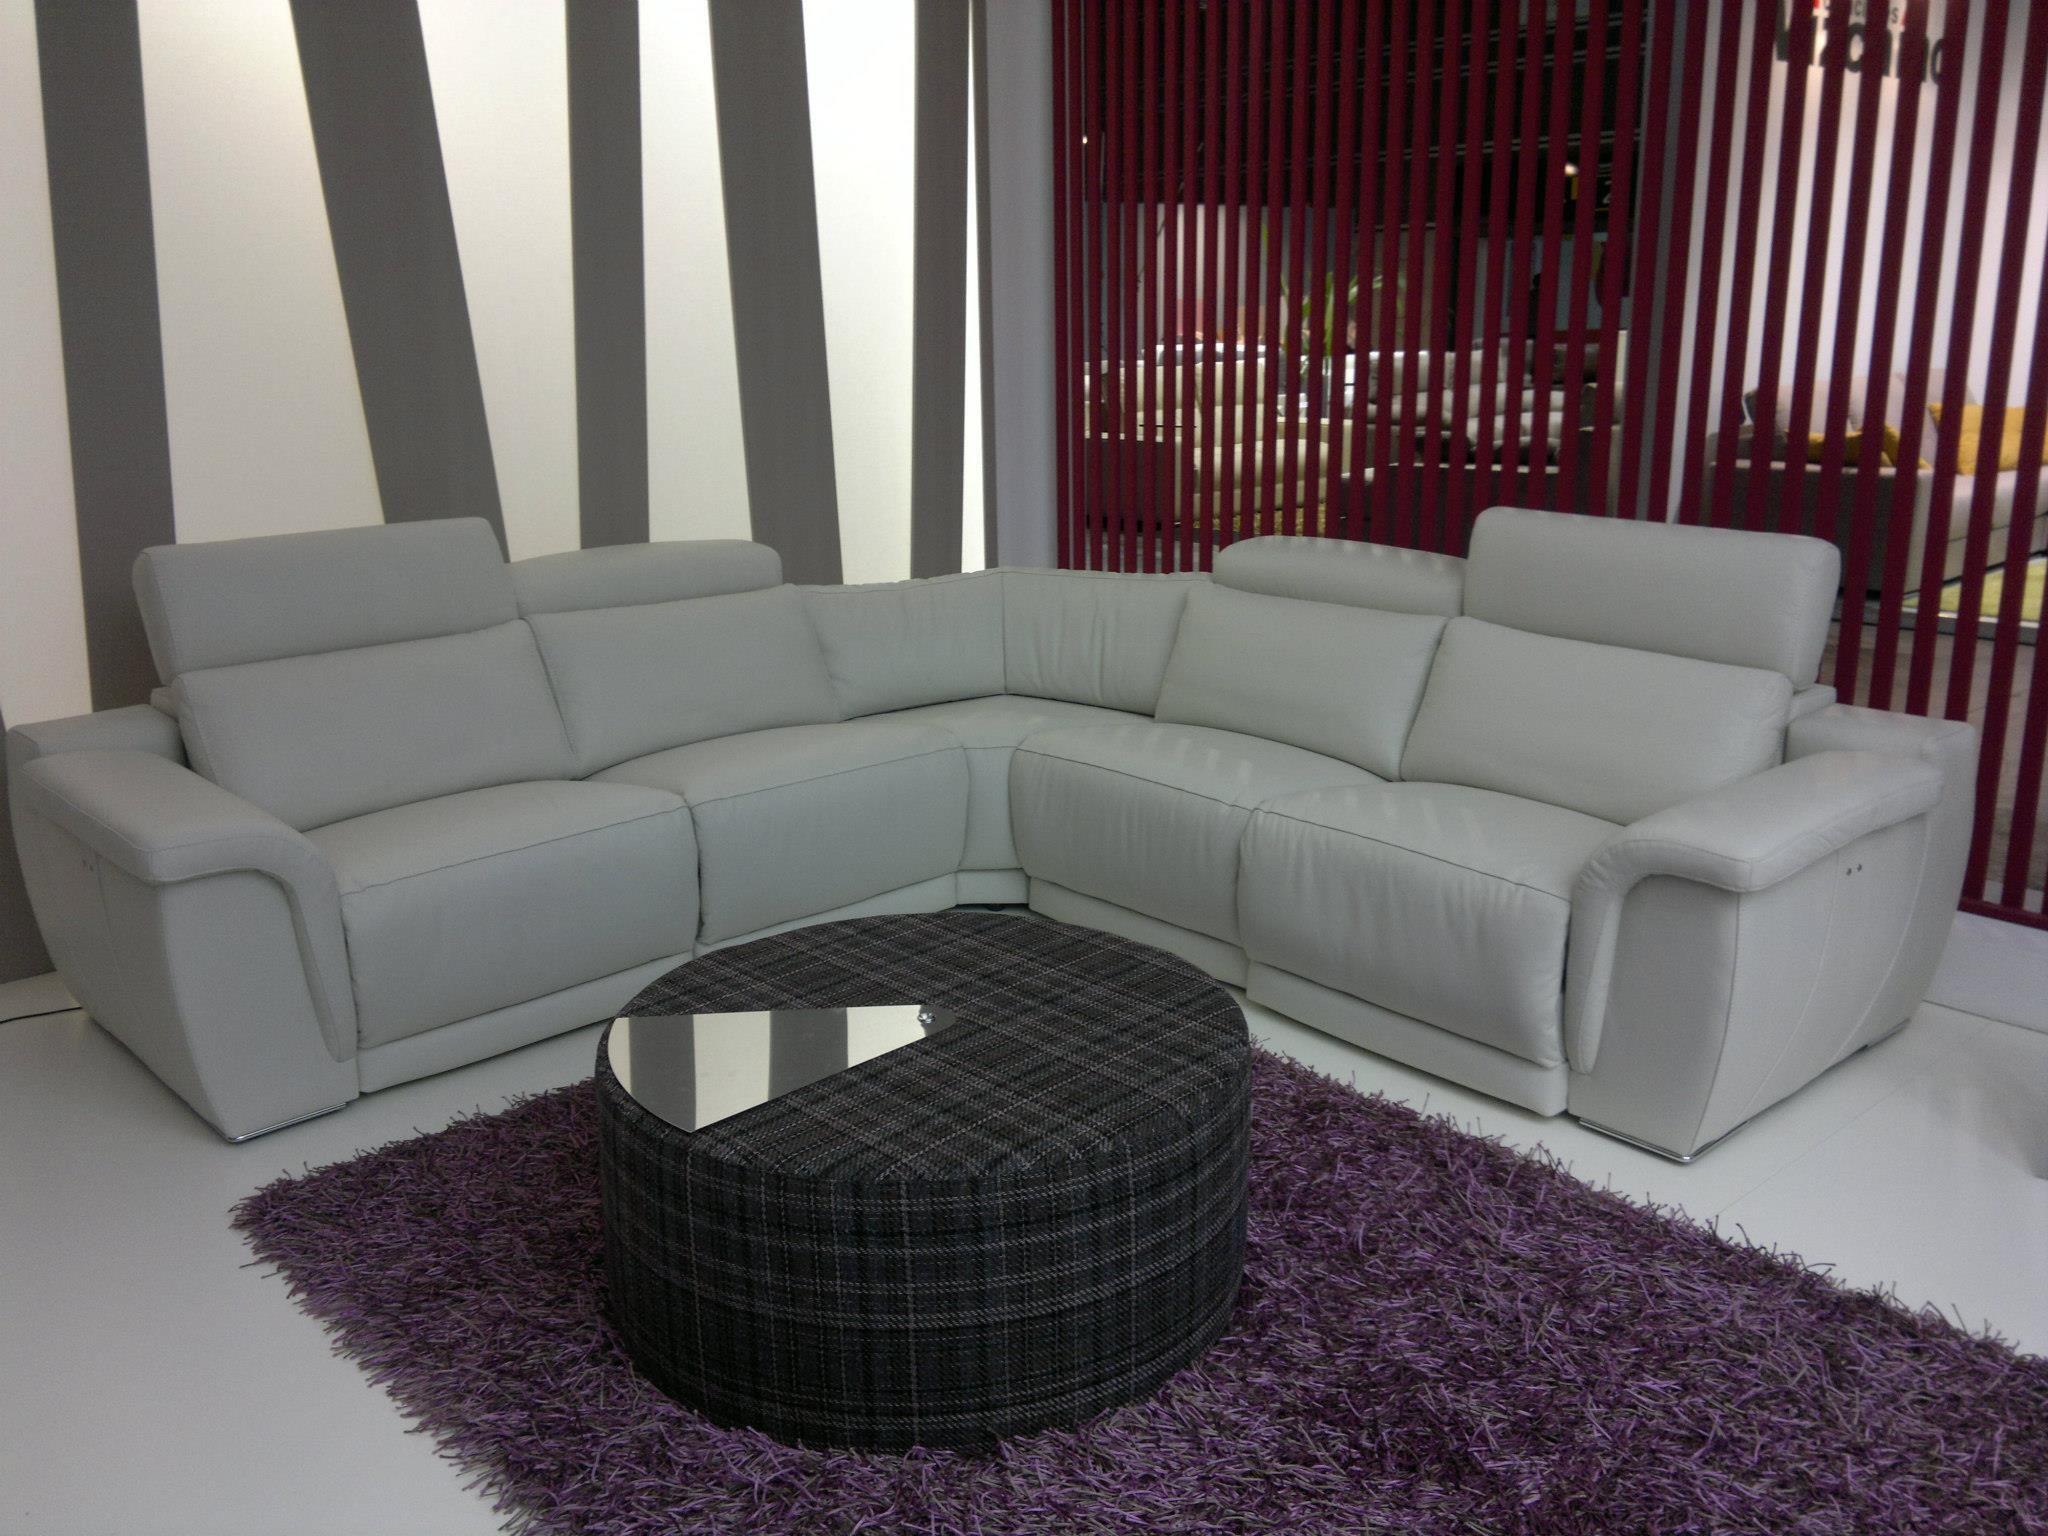 Rinconera modelo lisboa modular relax motor o fijo con - Sofa cama minimalista ...